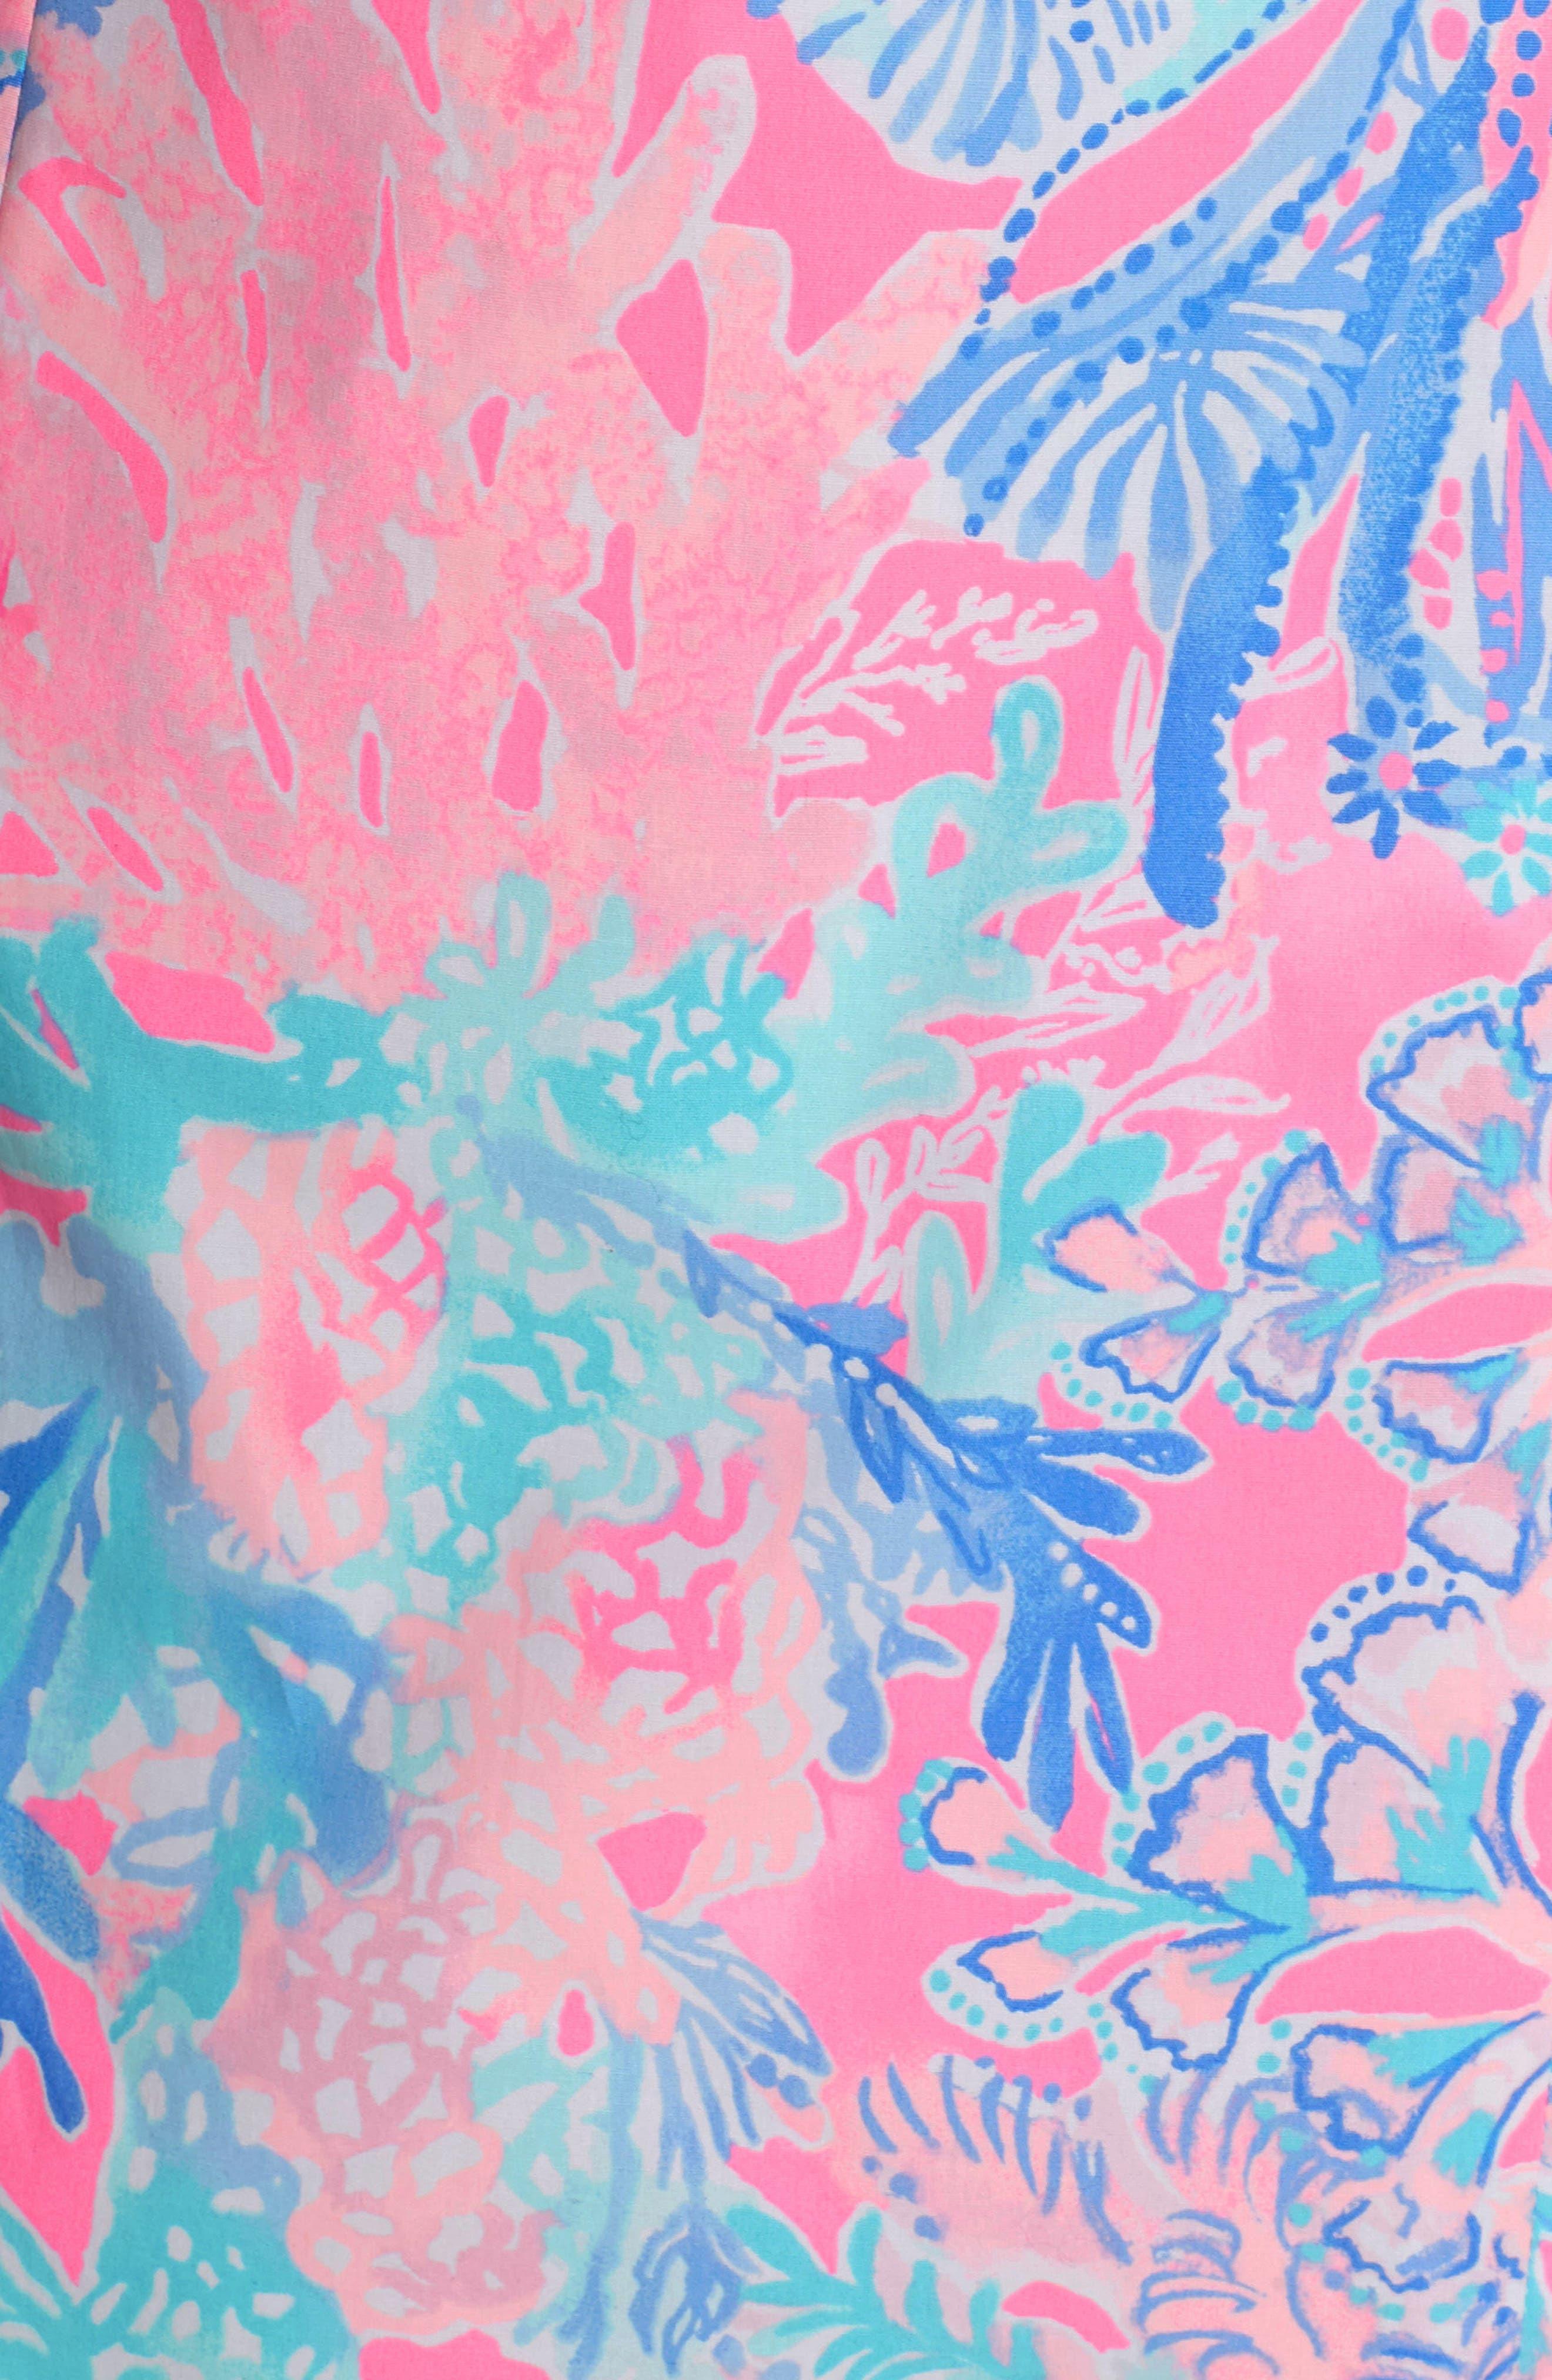 Fiesta Stretch Sheath Dress,                             Alternate thumbnail 6, color,                             LIGHT PASCHA PINK AQUADESIAC